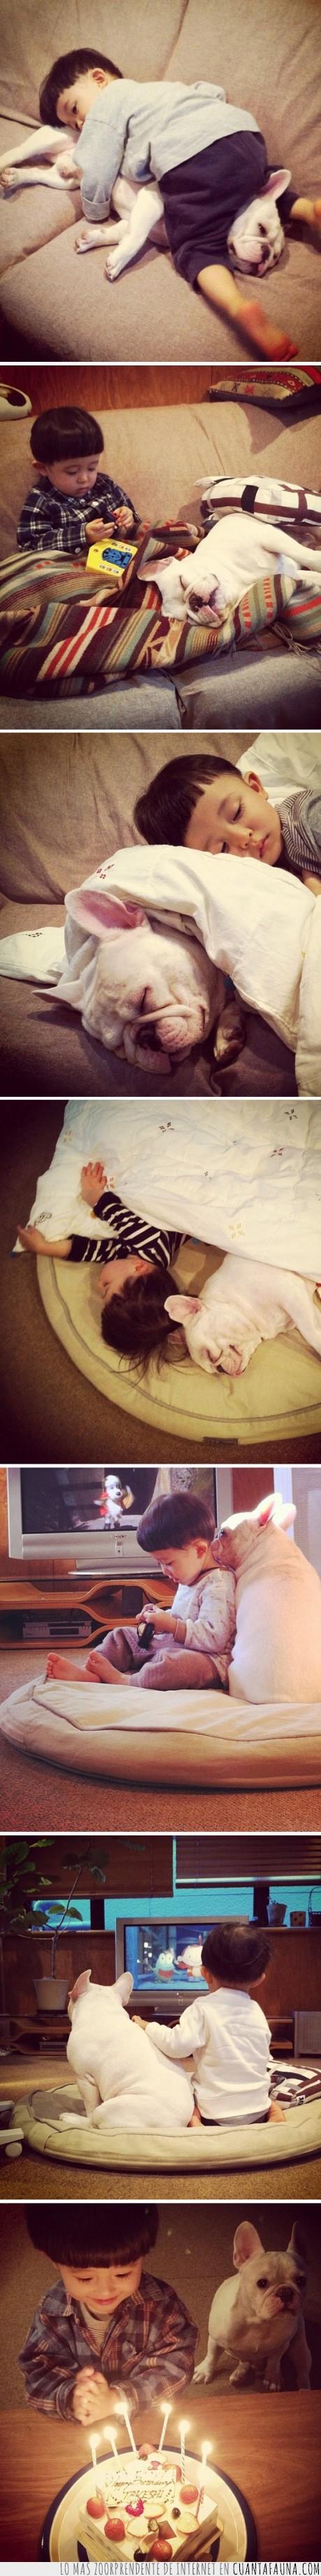 amigo,asiatico,bulldog,capa,casco,chino,dormir,junto,niño,pelo,perro